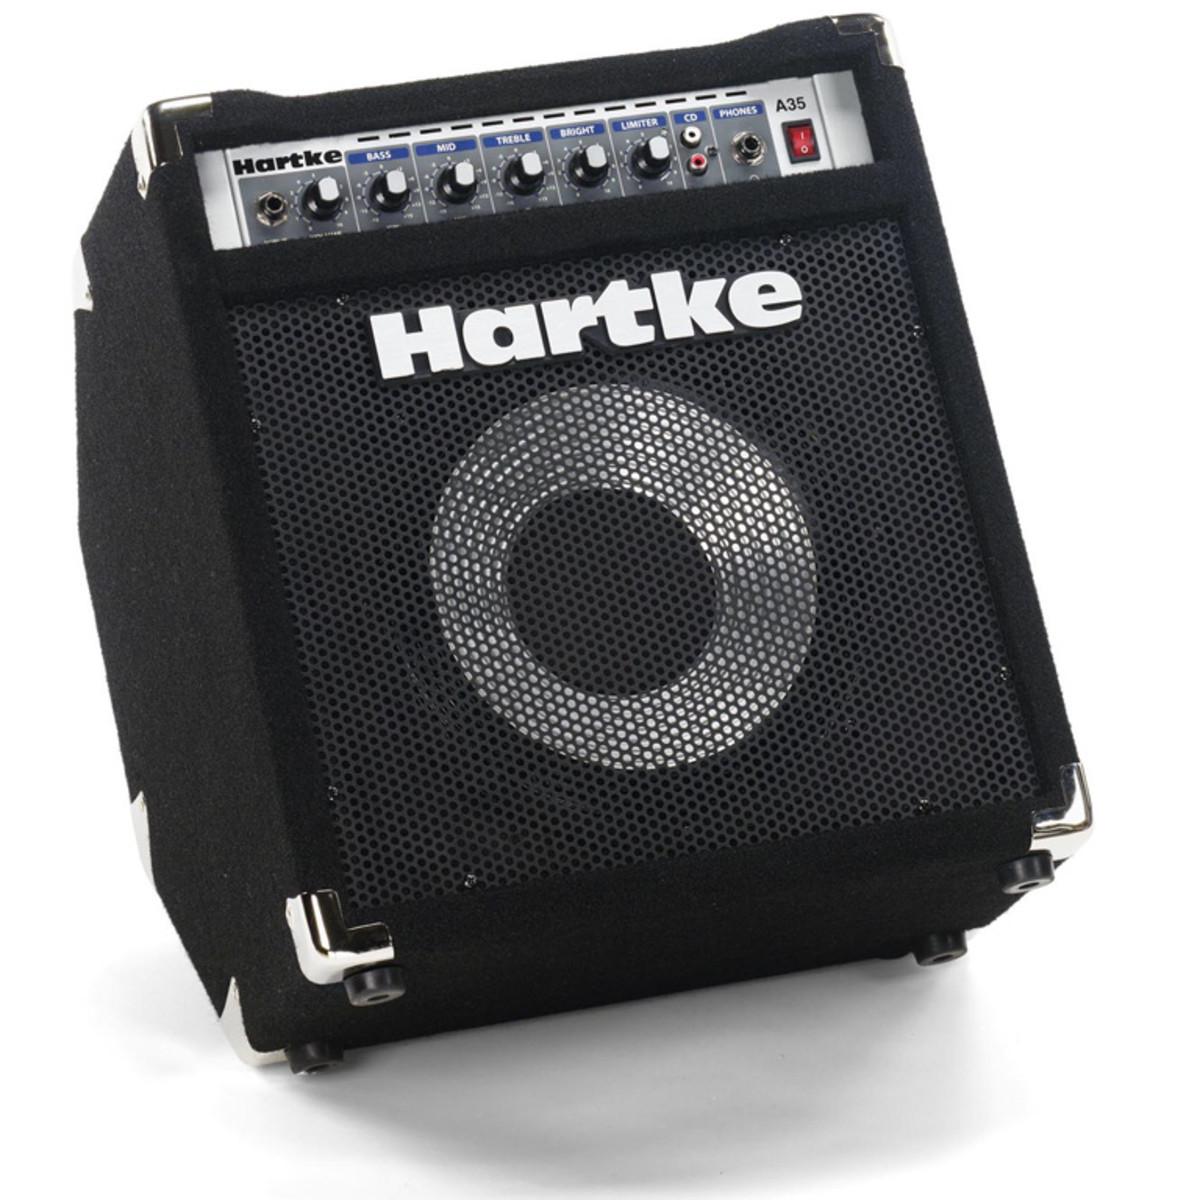 hartke a25 series bass combo amp at. Black Bedroom Furniture Sets. Home Design Ideas